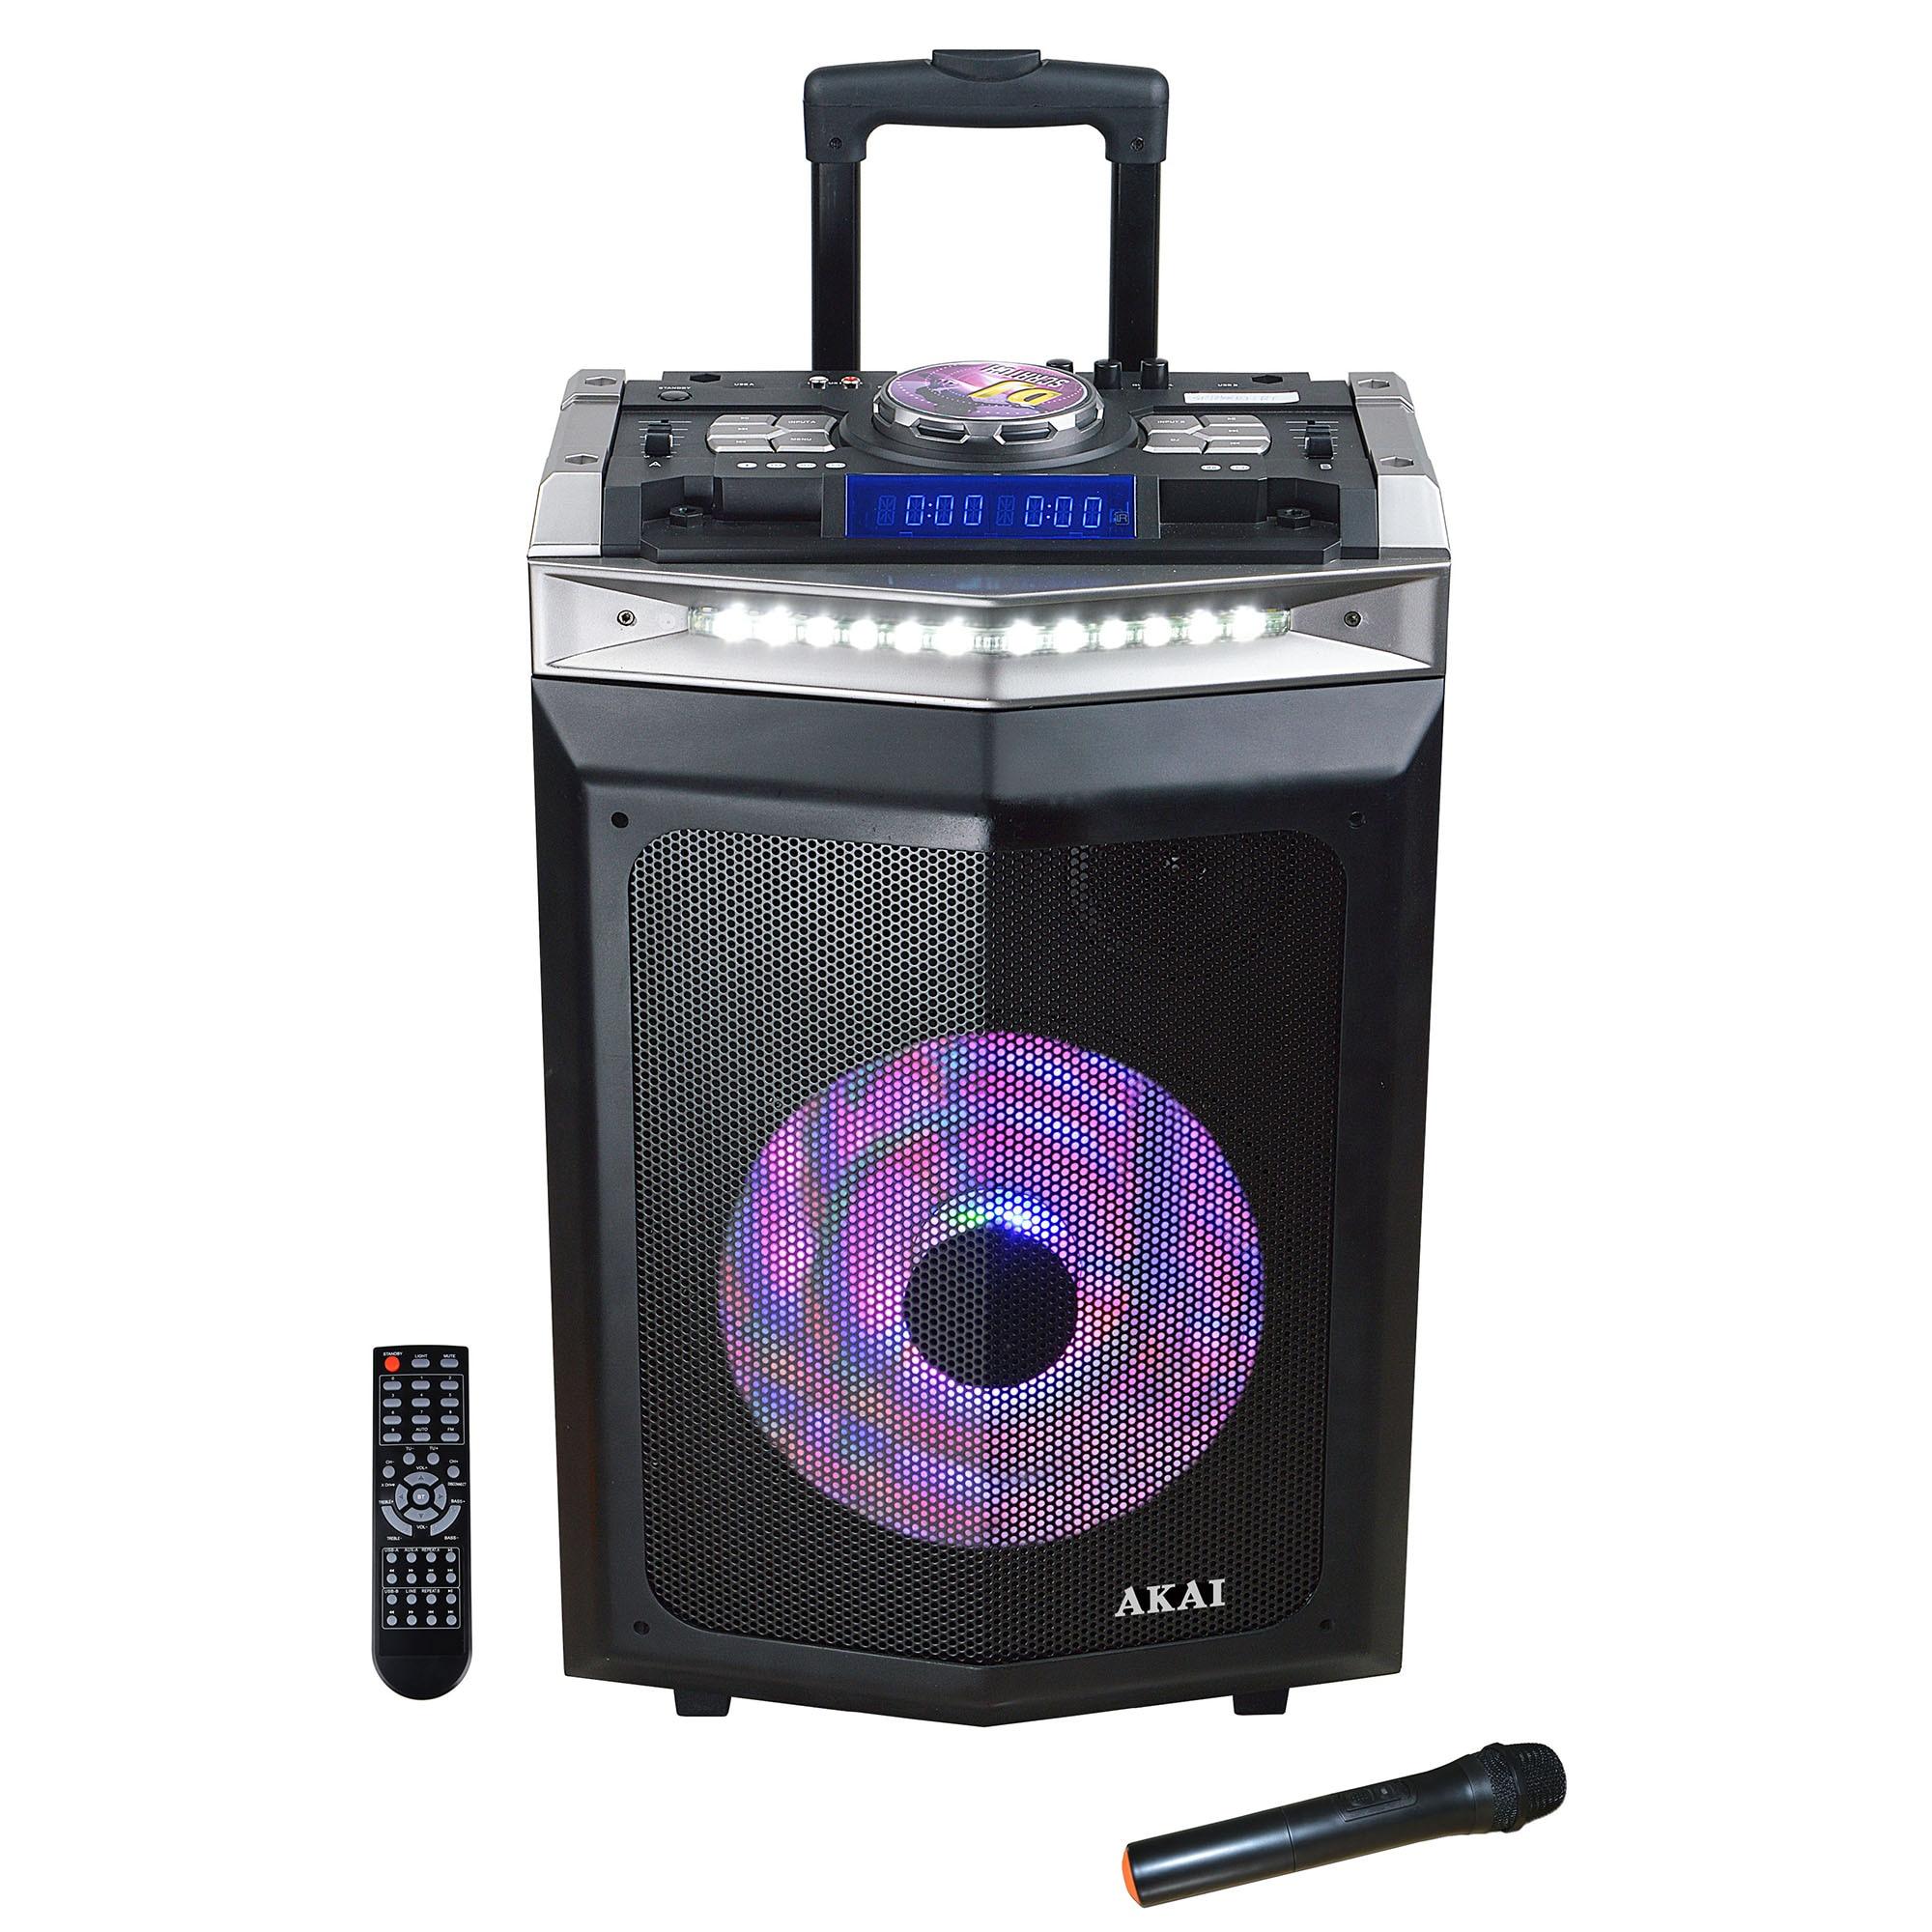 Fotografie Boxa activa portabila AKAI DJ-6112BT cu DJ mixer, Bluetooth, dual USB, radio, microfon wireless, telecomanda si mufa intrare chitara, 120W